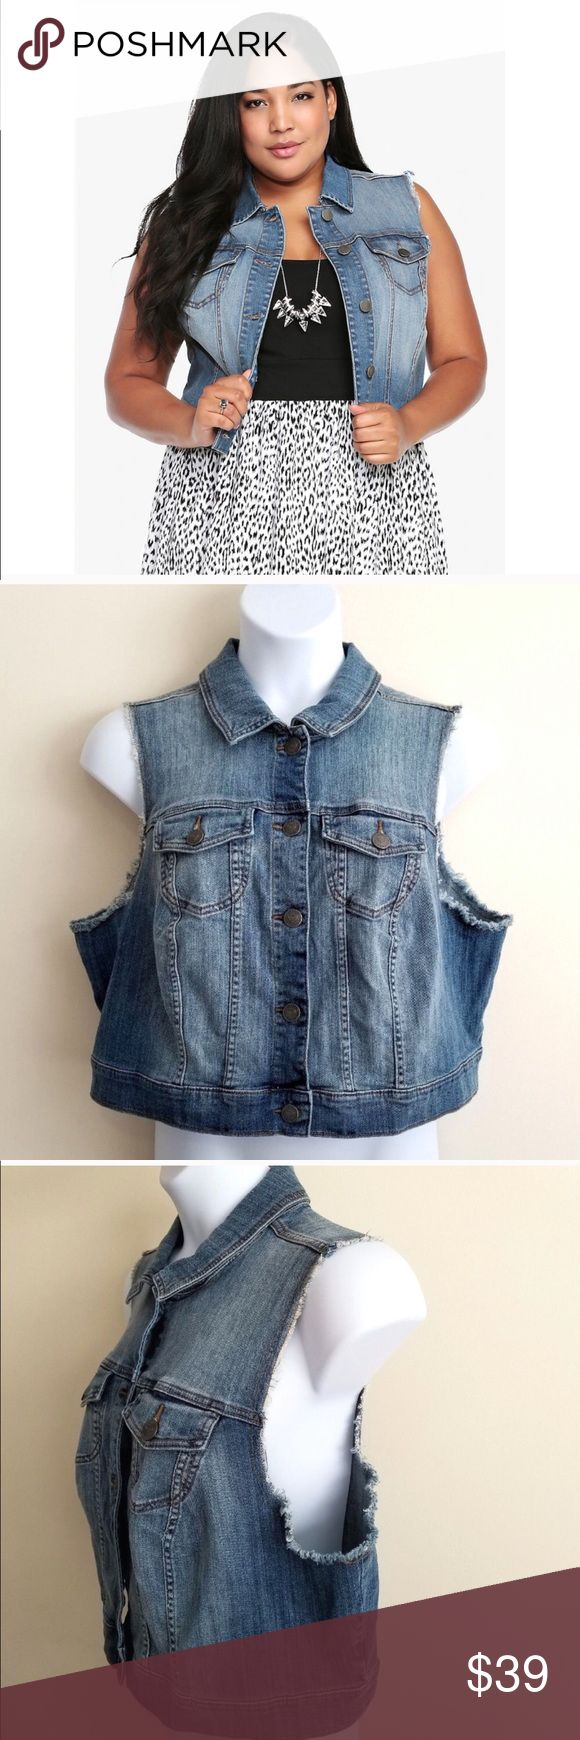 e3d9f705cb3 Torrid Cropped Denim Vest Torrid cropped denim jean vest